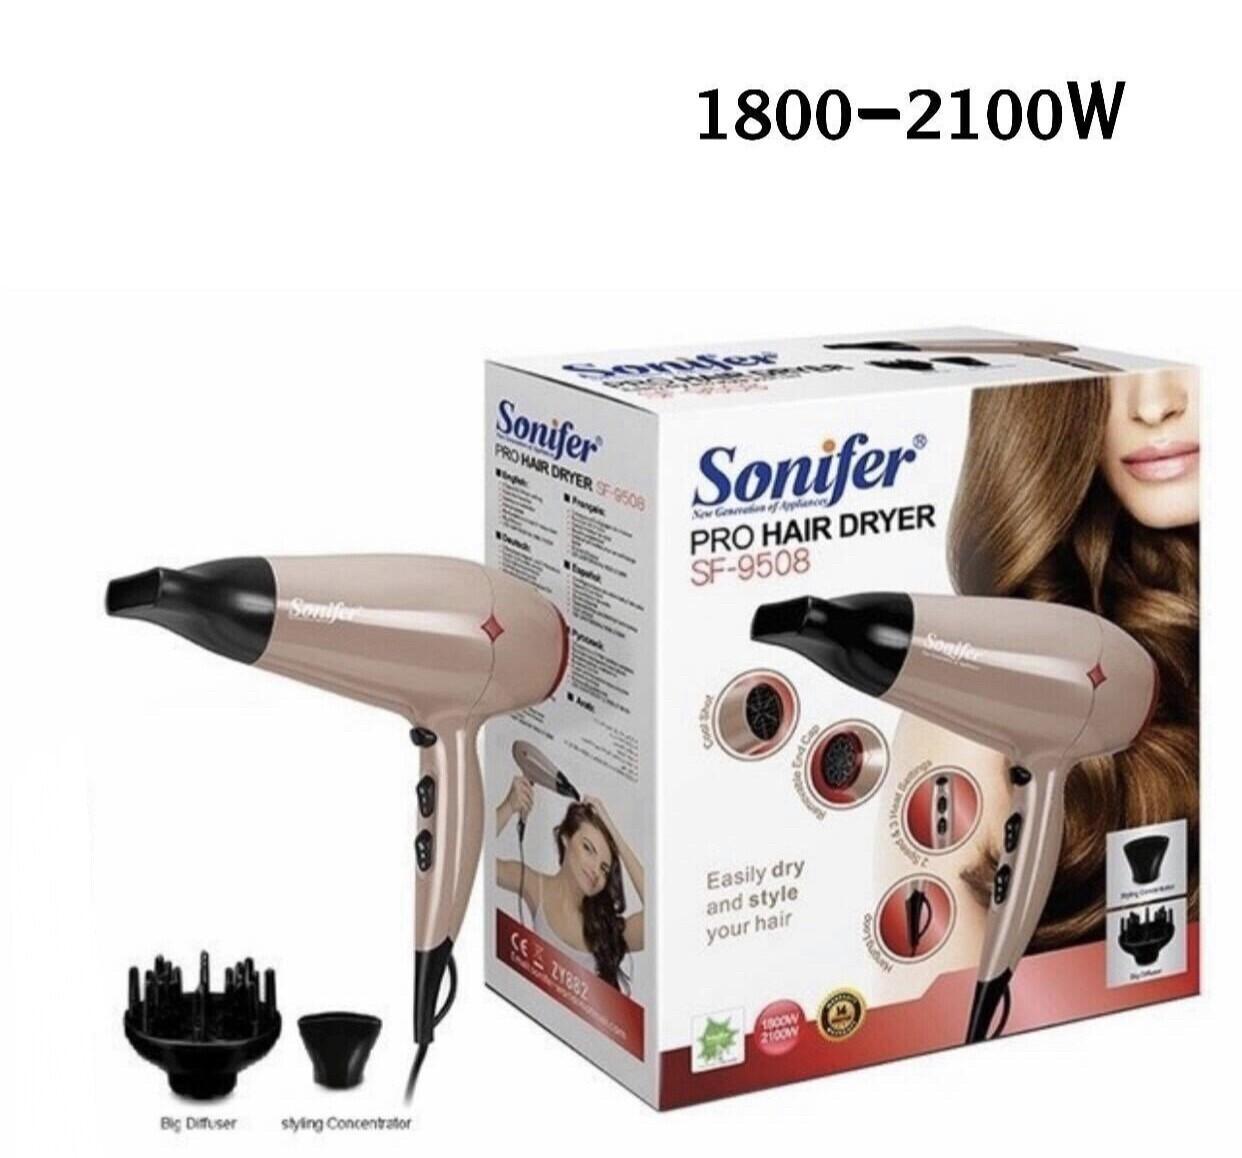 SONIFER Hair Dryer SF-9508